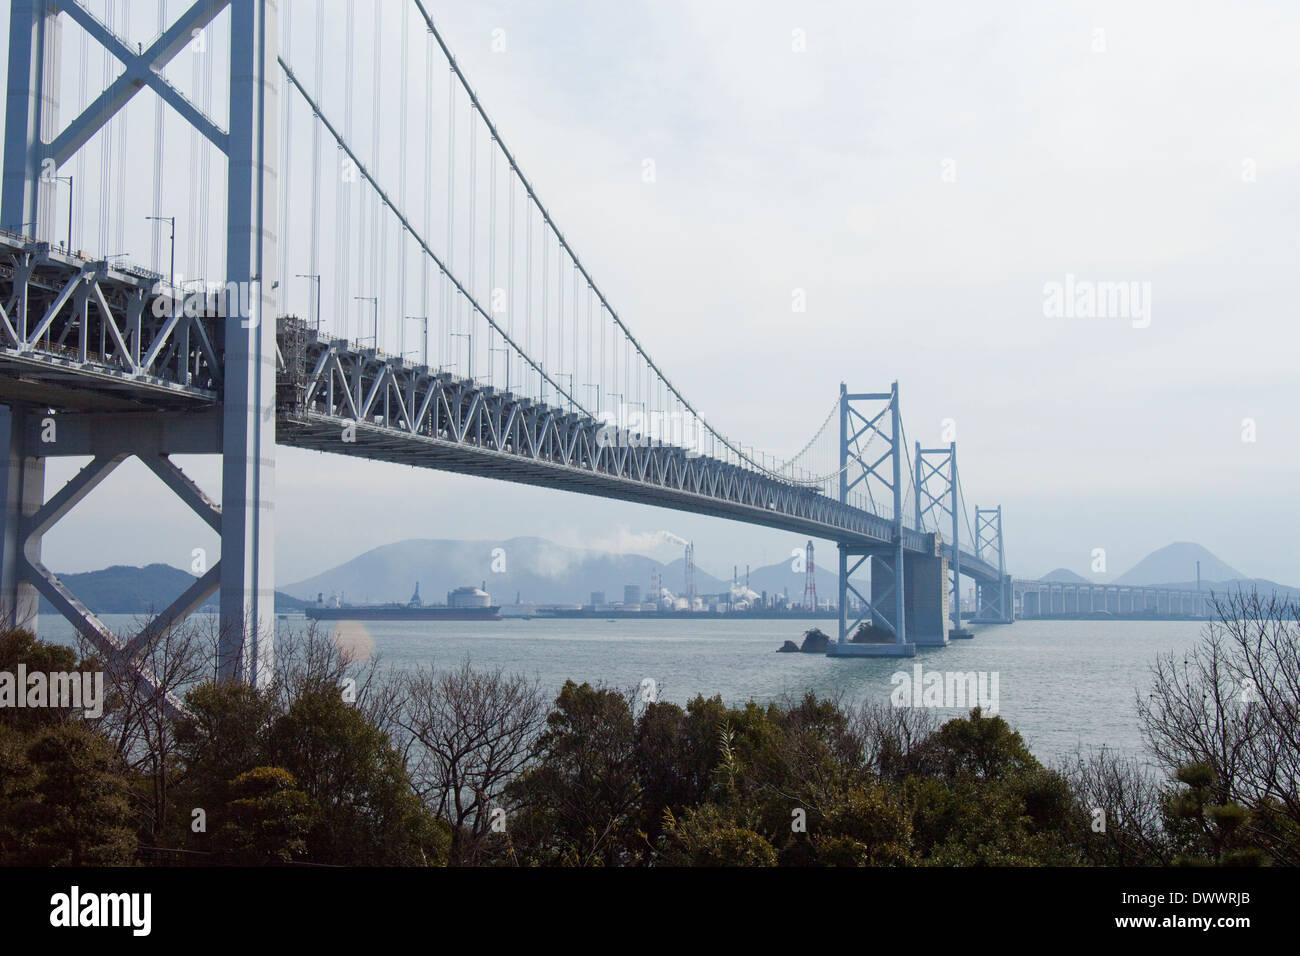 Seto Ohashi Bridge, Japan - Stock Image